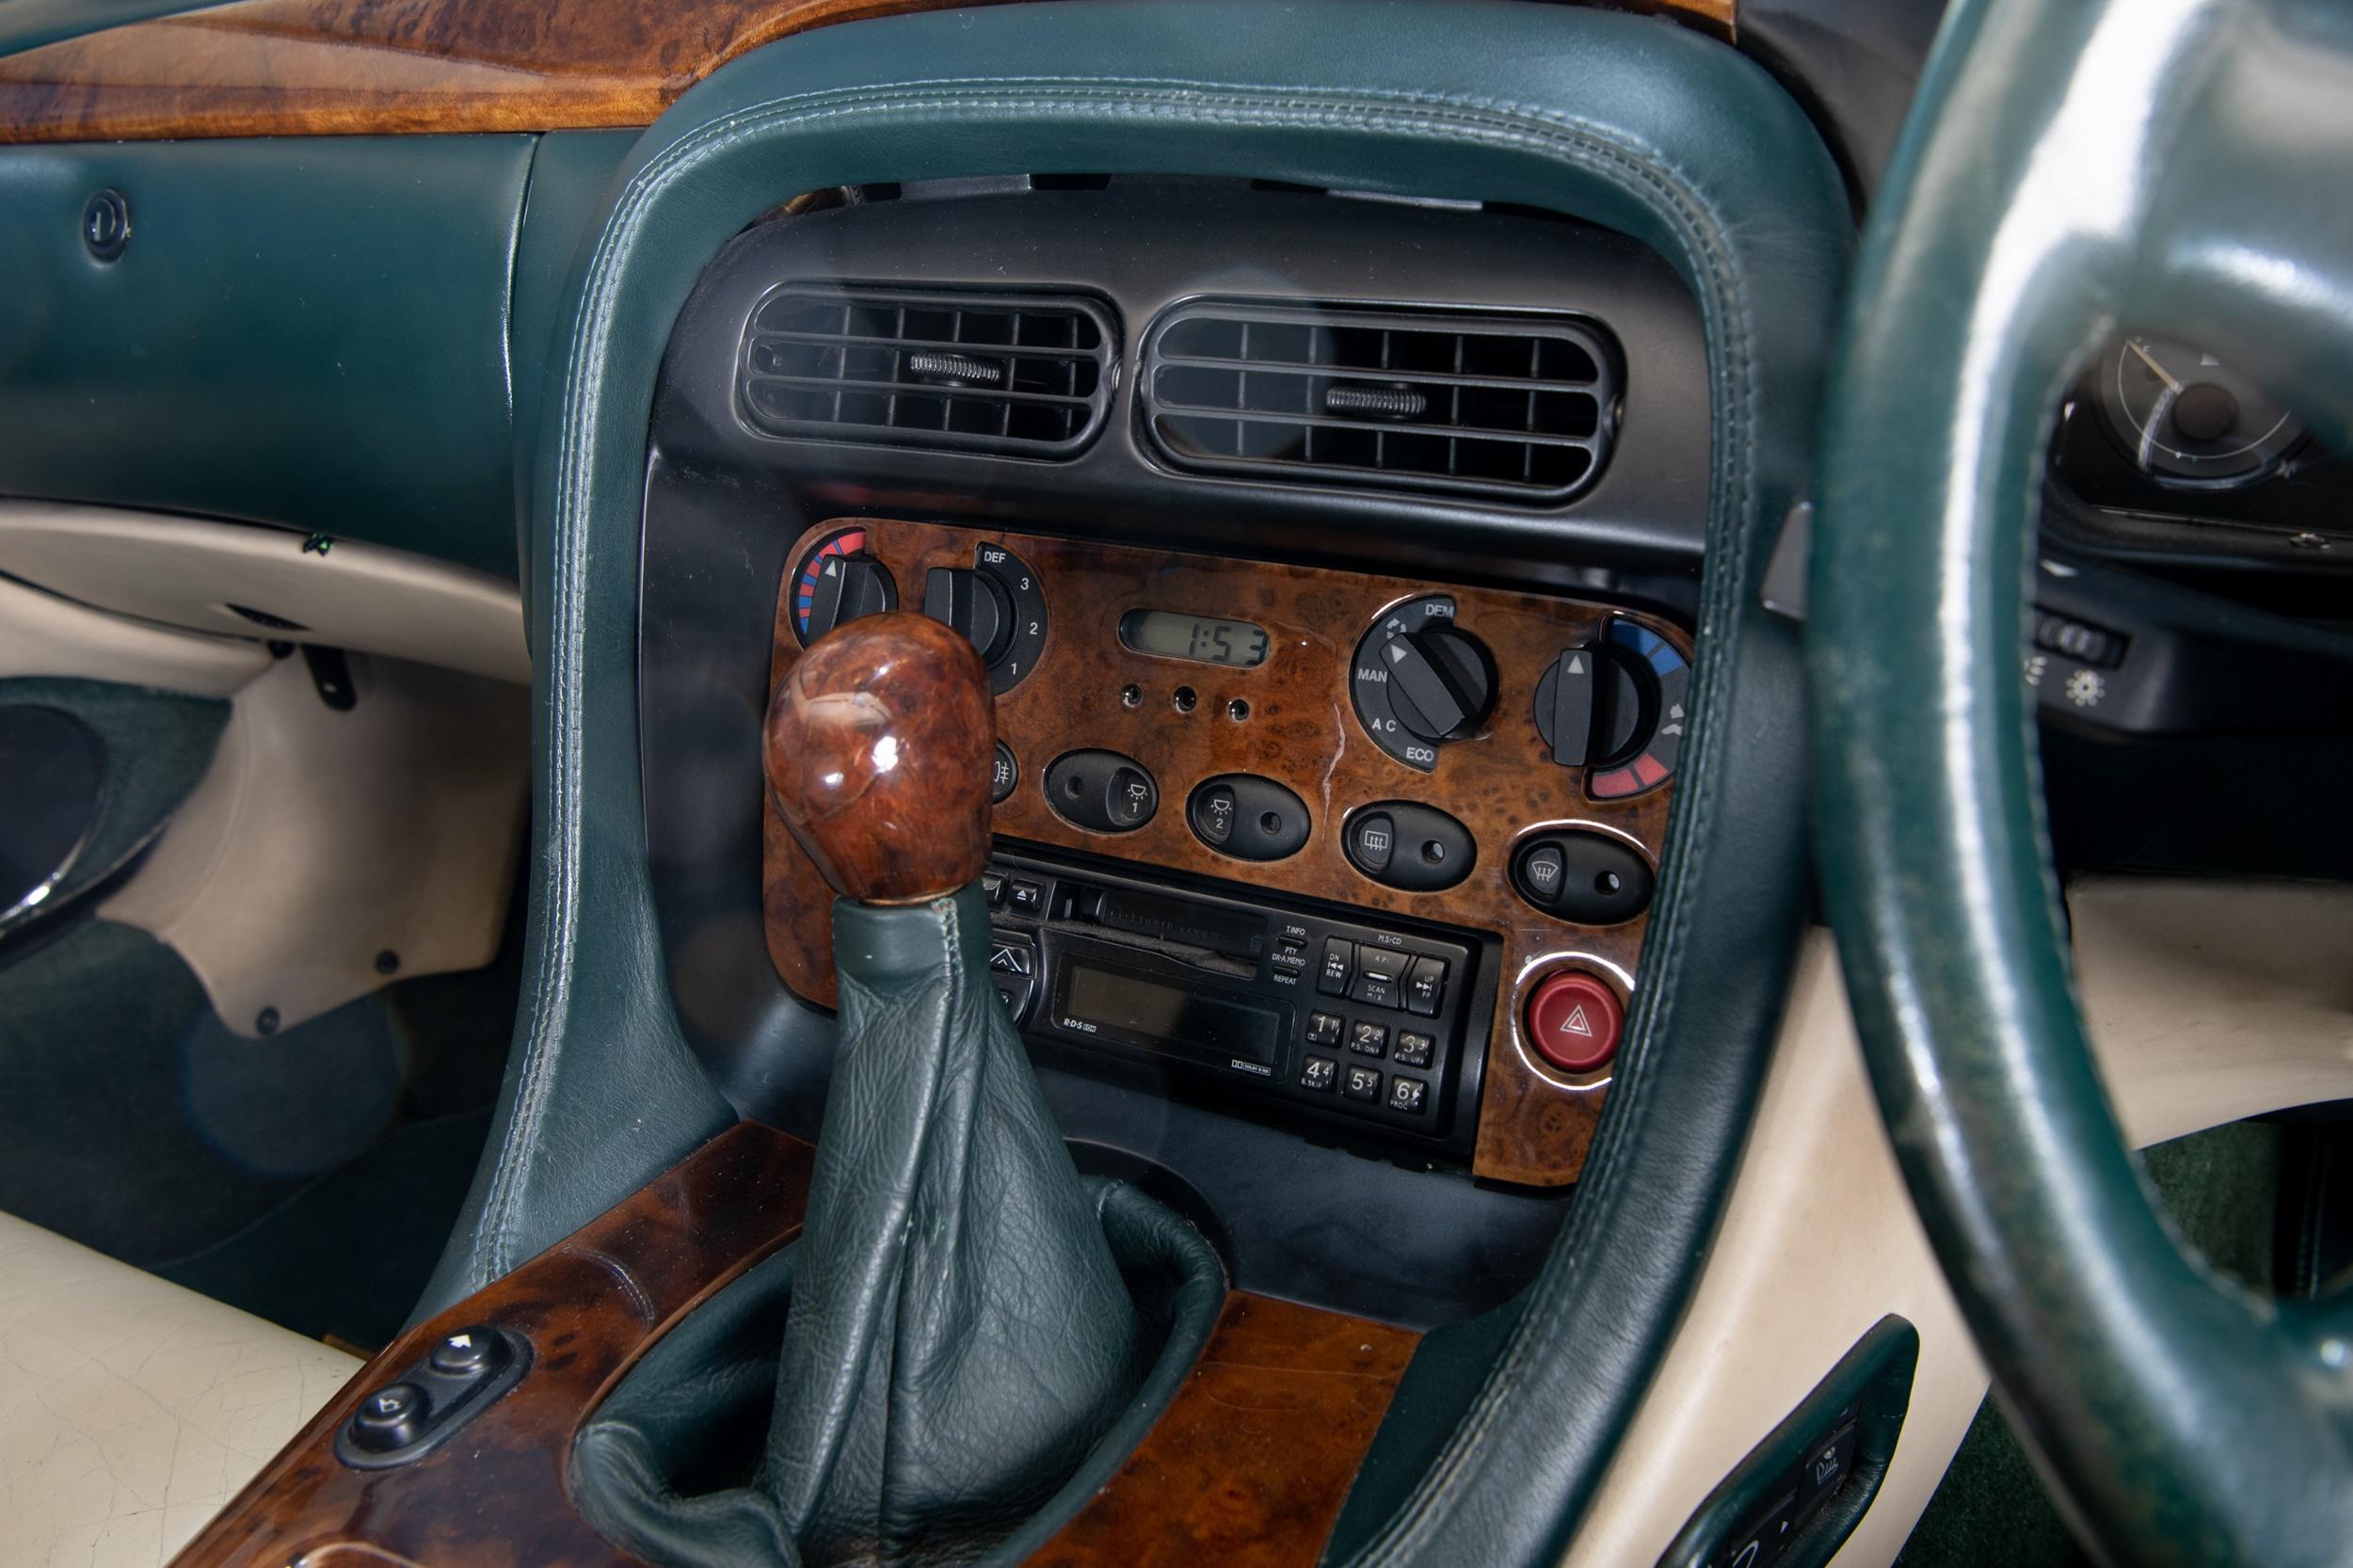 A 1995 ASTON MARTIN DB7 3.2 COUPE MOTOR CAR - Image 7 of 16